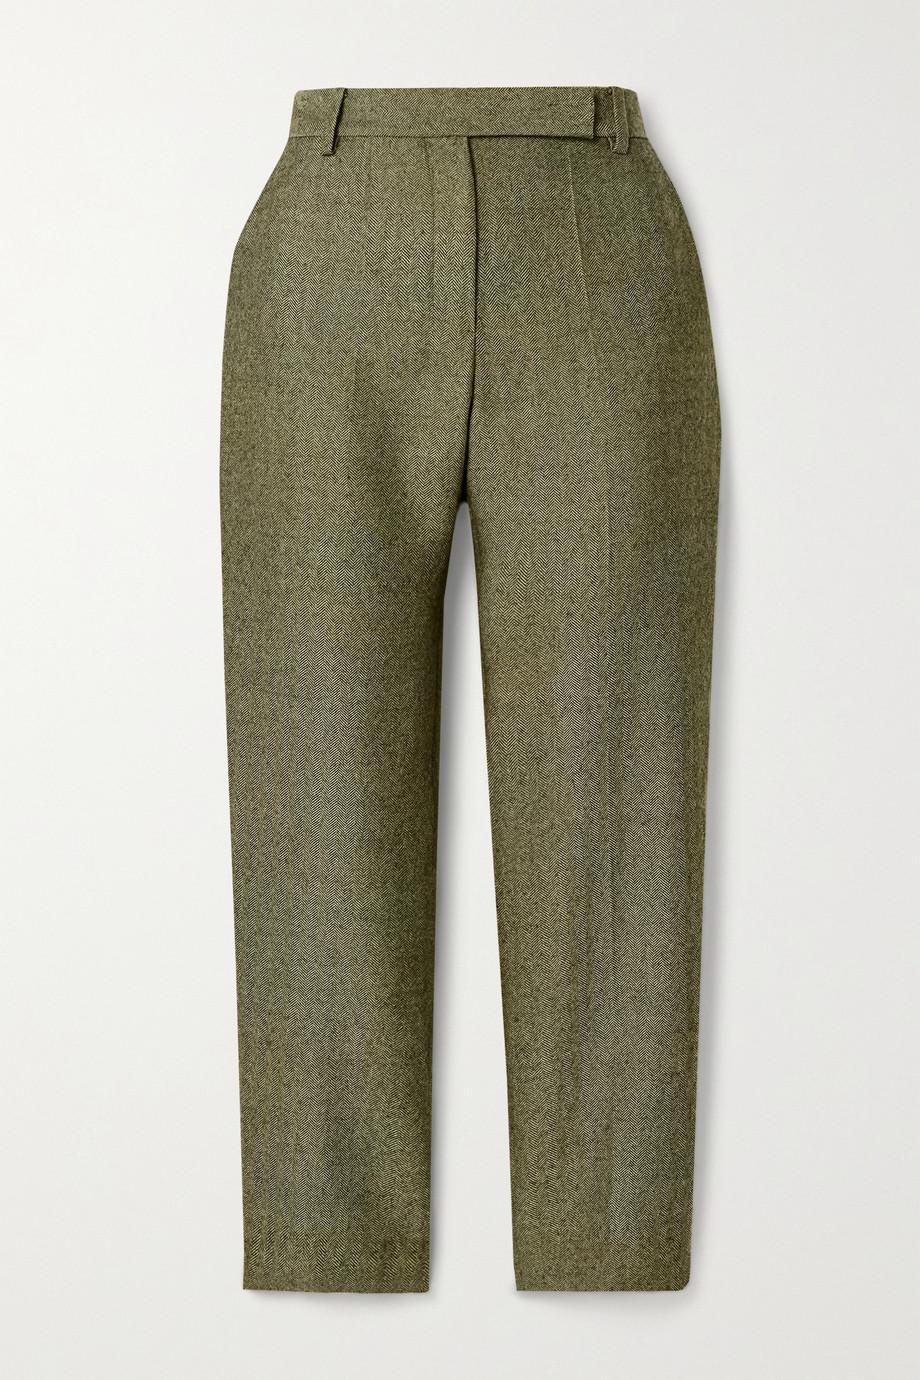 Brandon Maxwell Cropped herringbone wool straight-leg pants